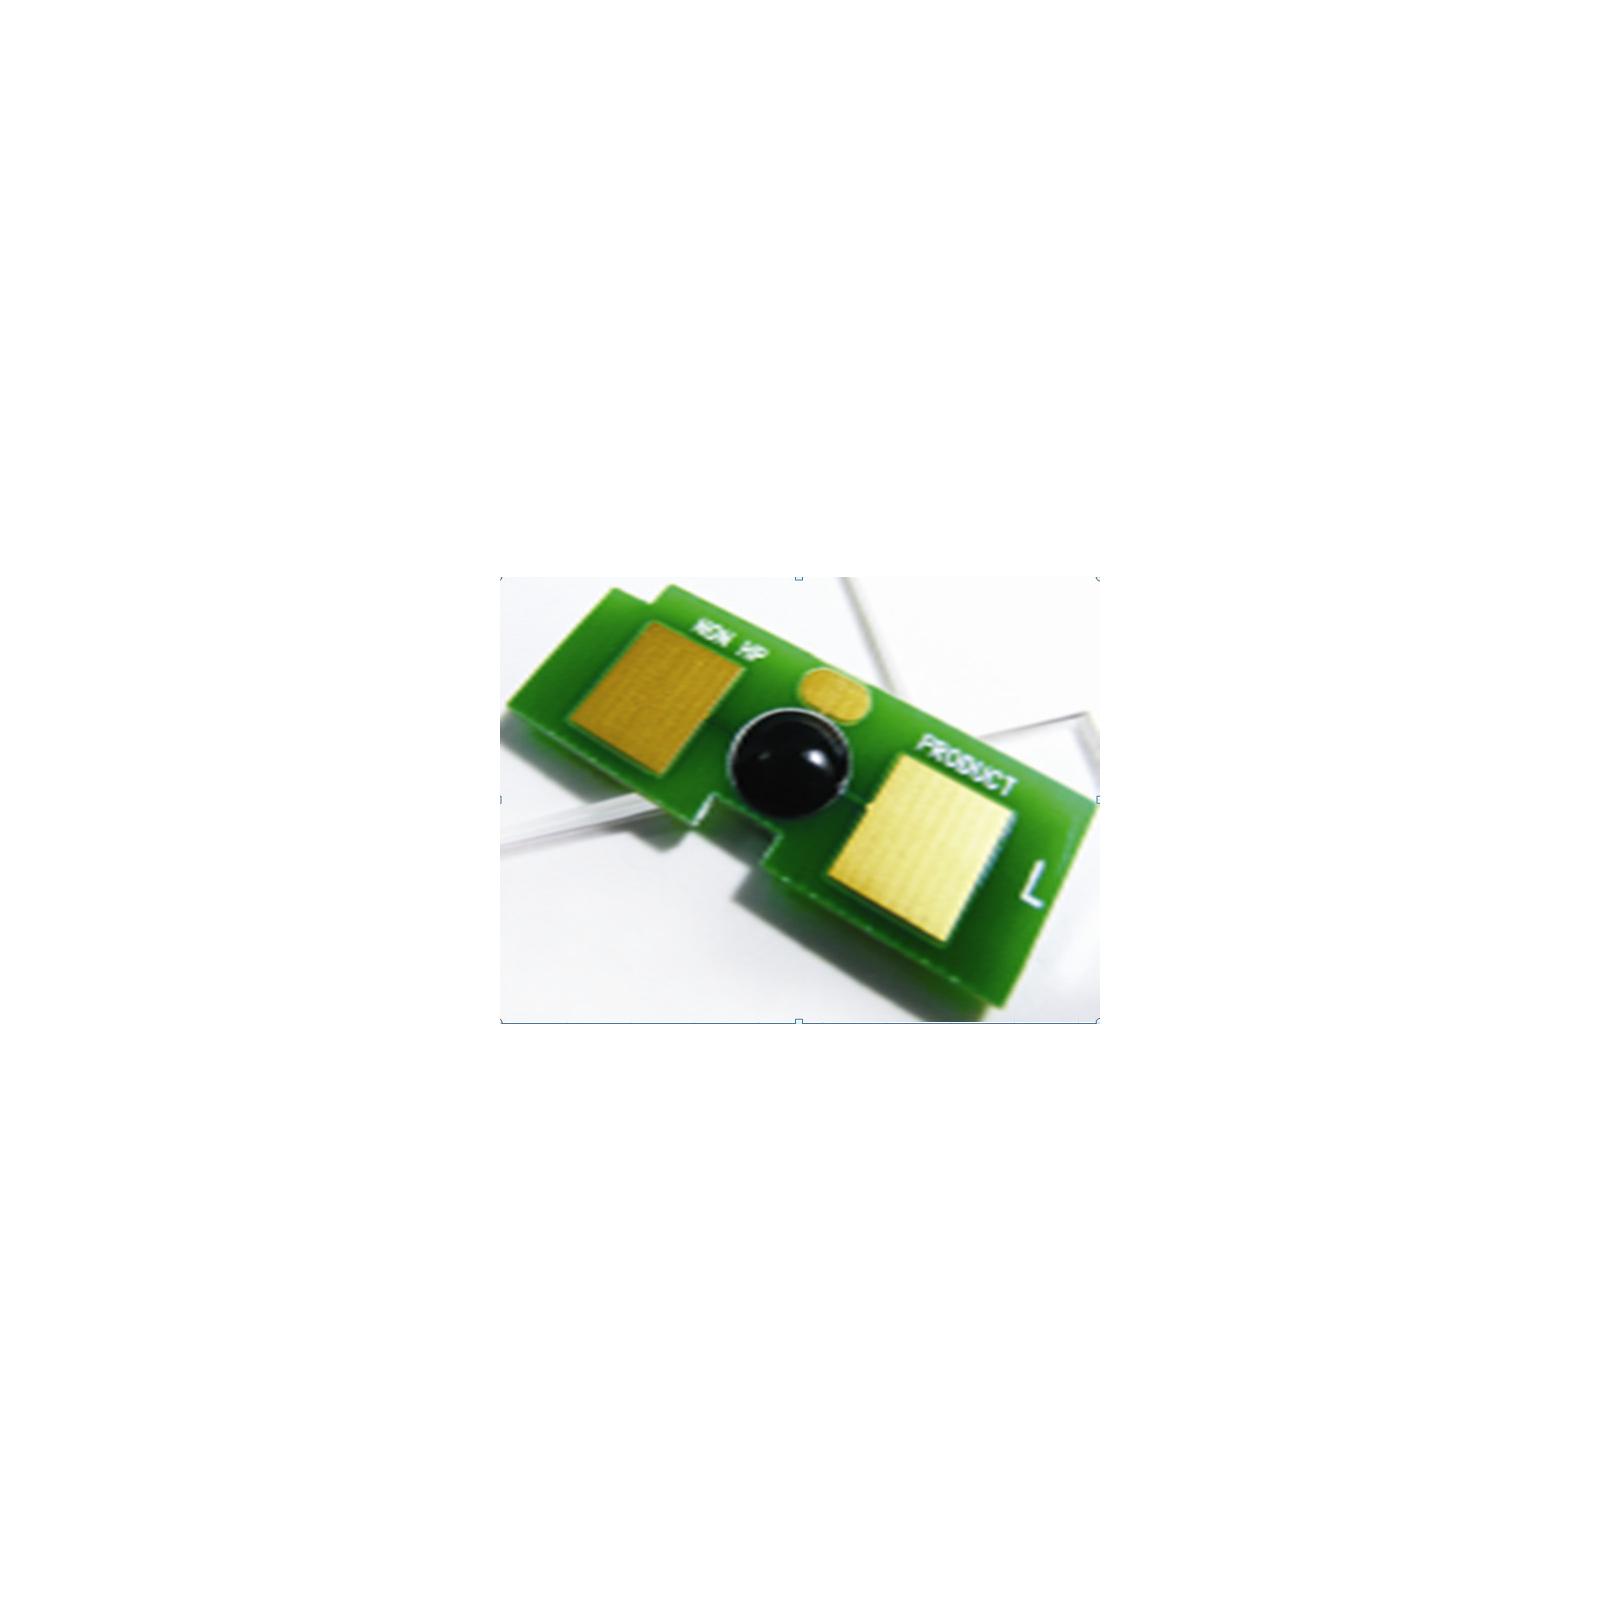 Чип для картриджа HP LJ P3005/M3027/ 3035 (A-Series) APEX (ALH-Q7551A-6,5K)